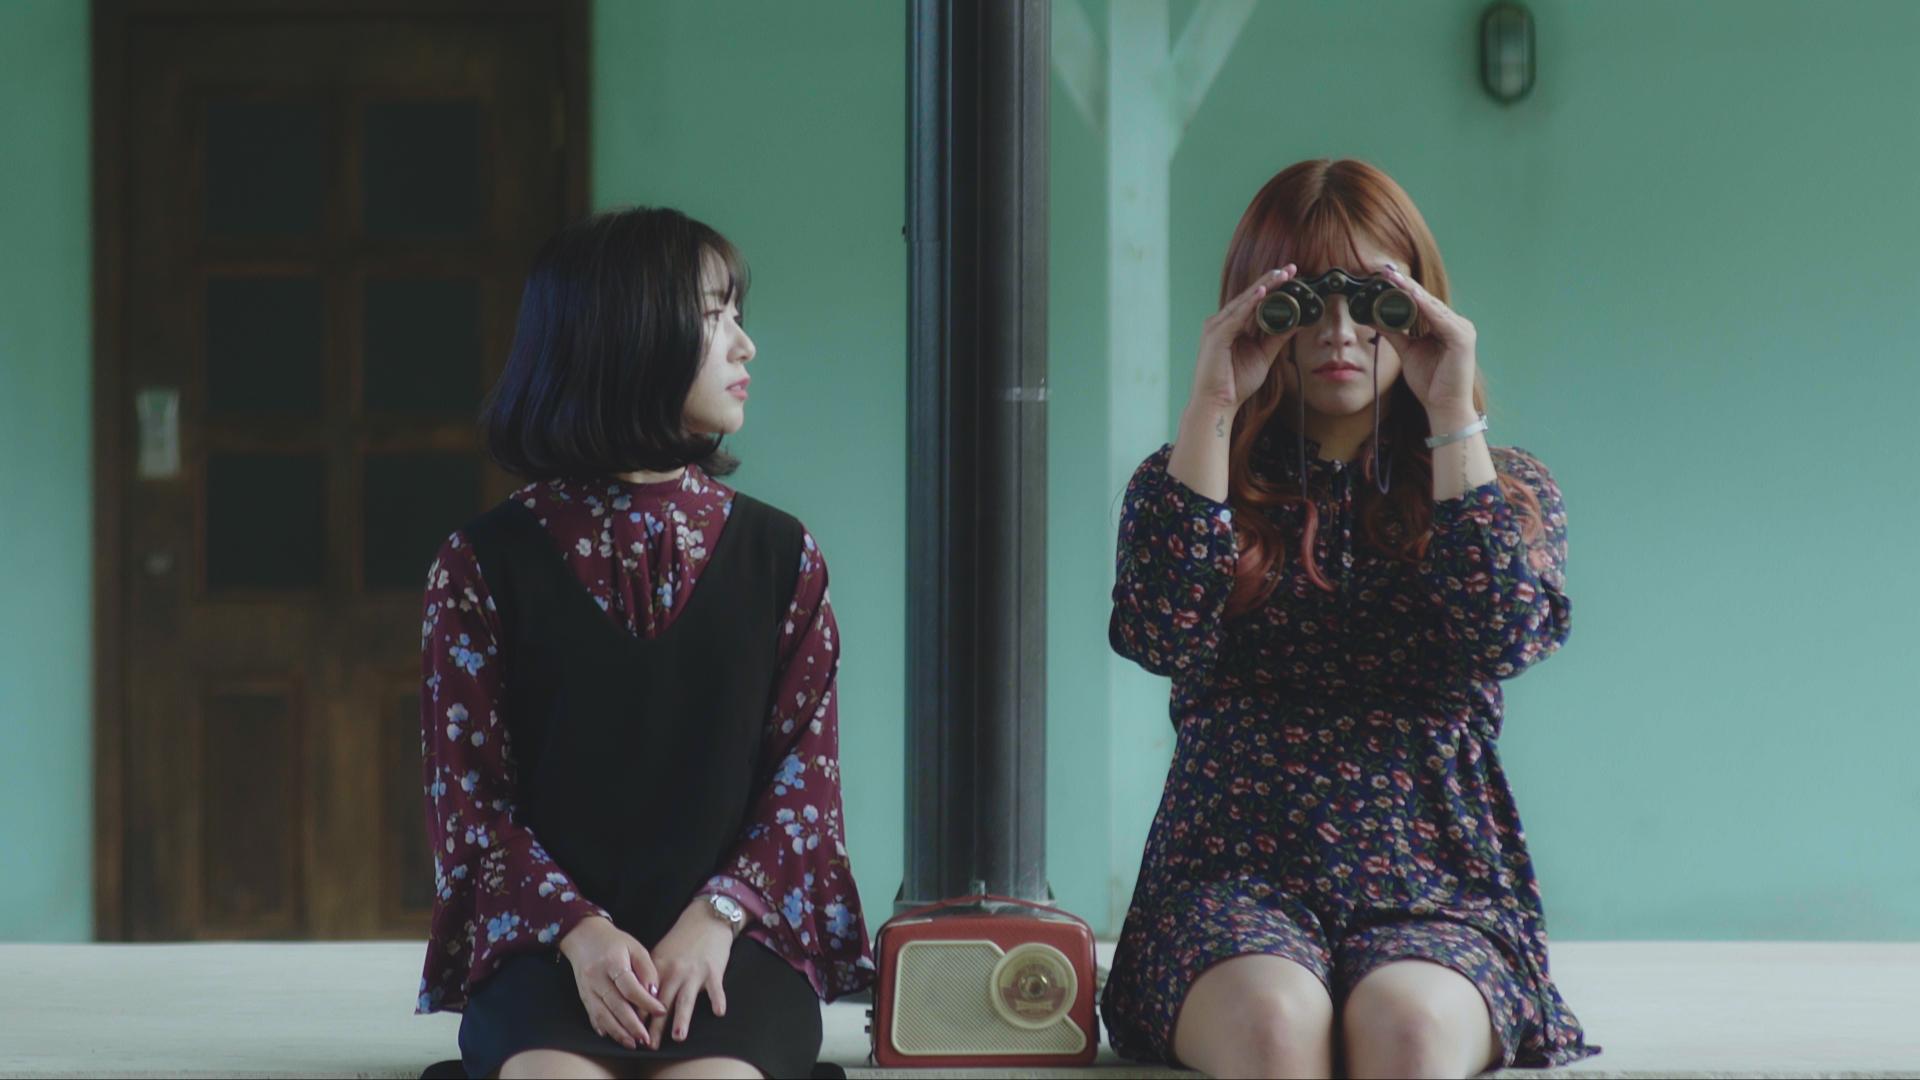 heeyeon yeowoon binoculars.jpg